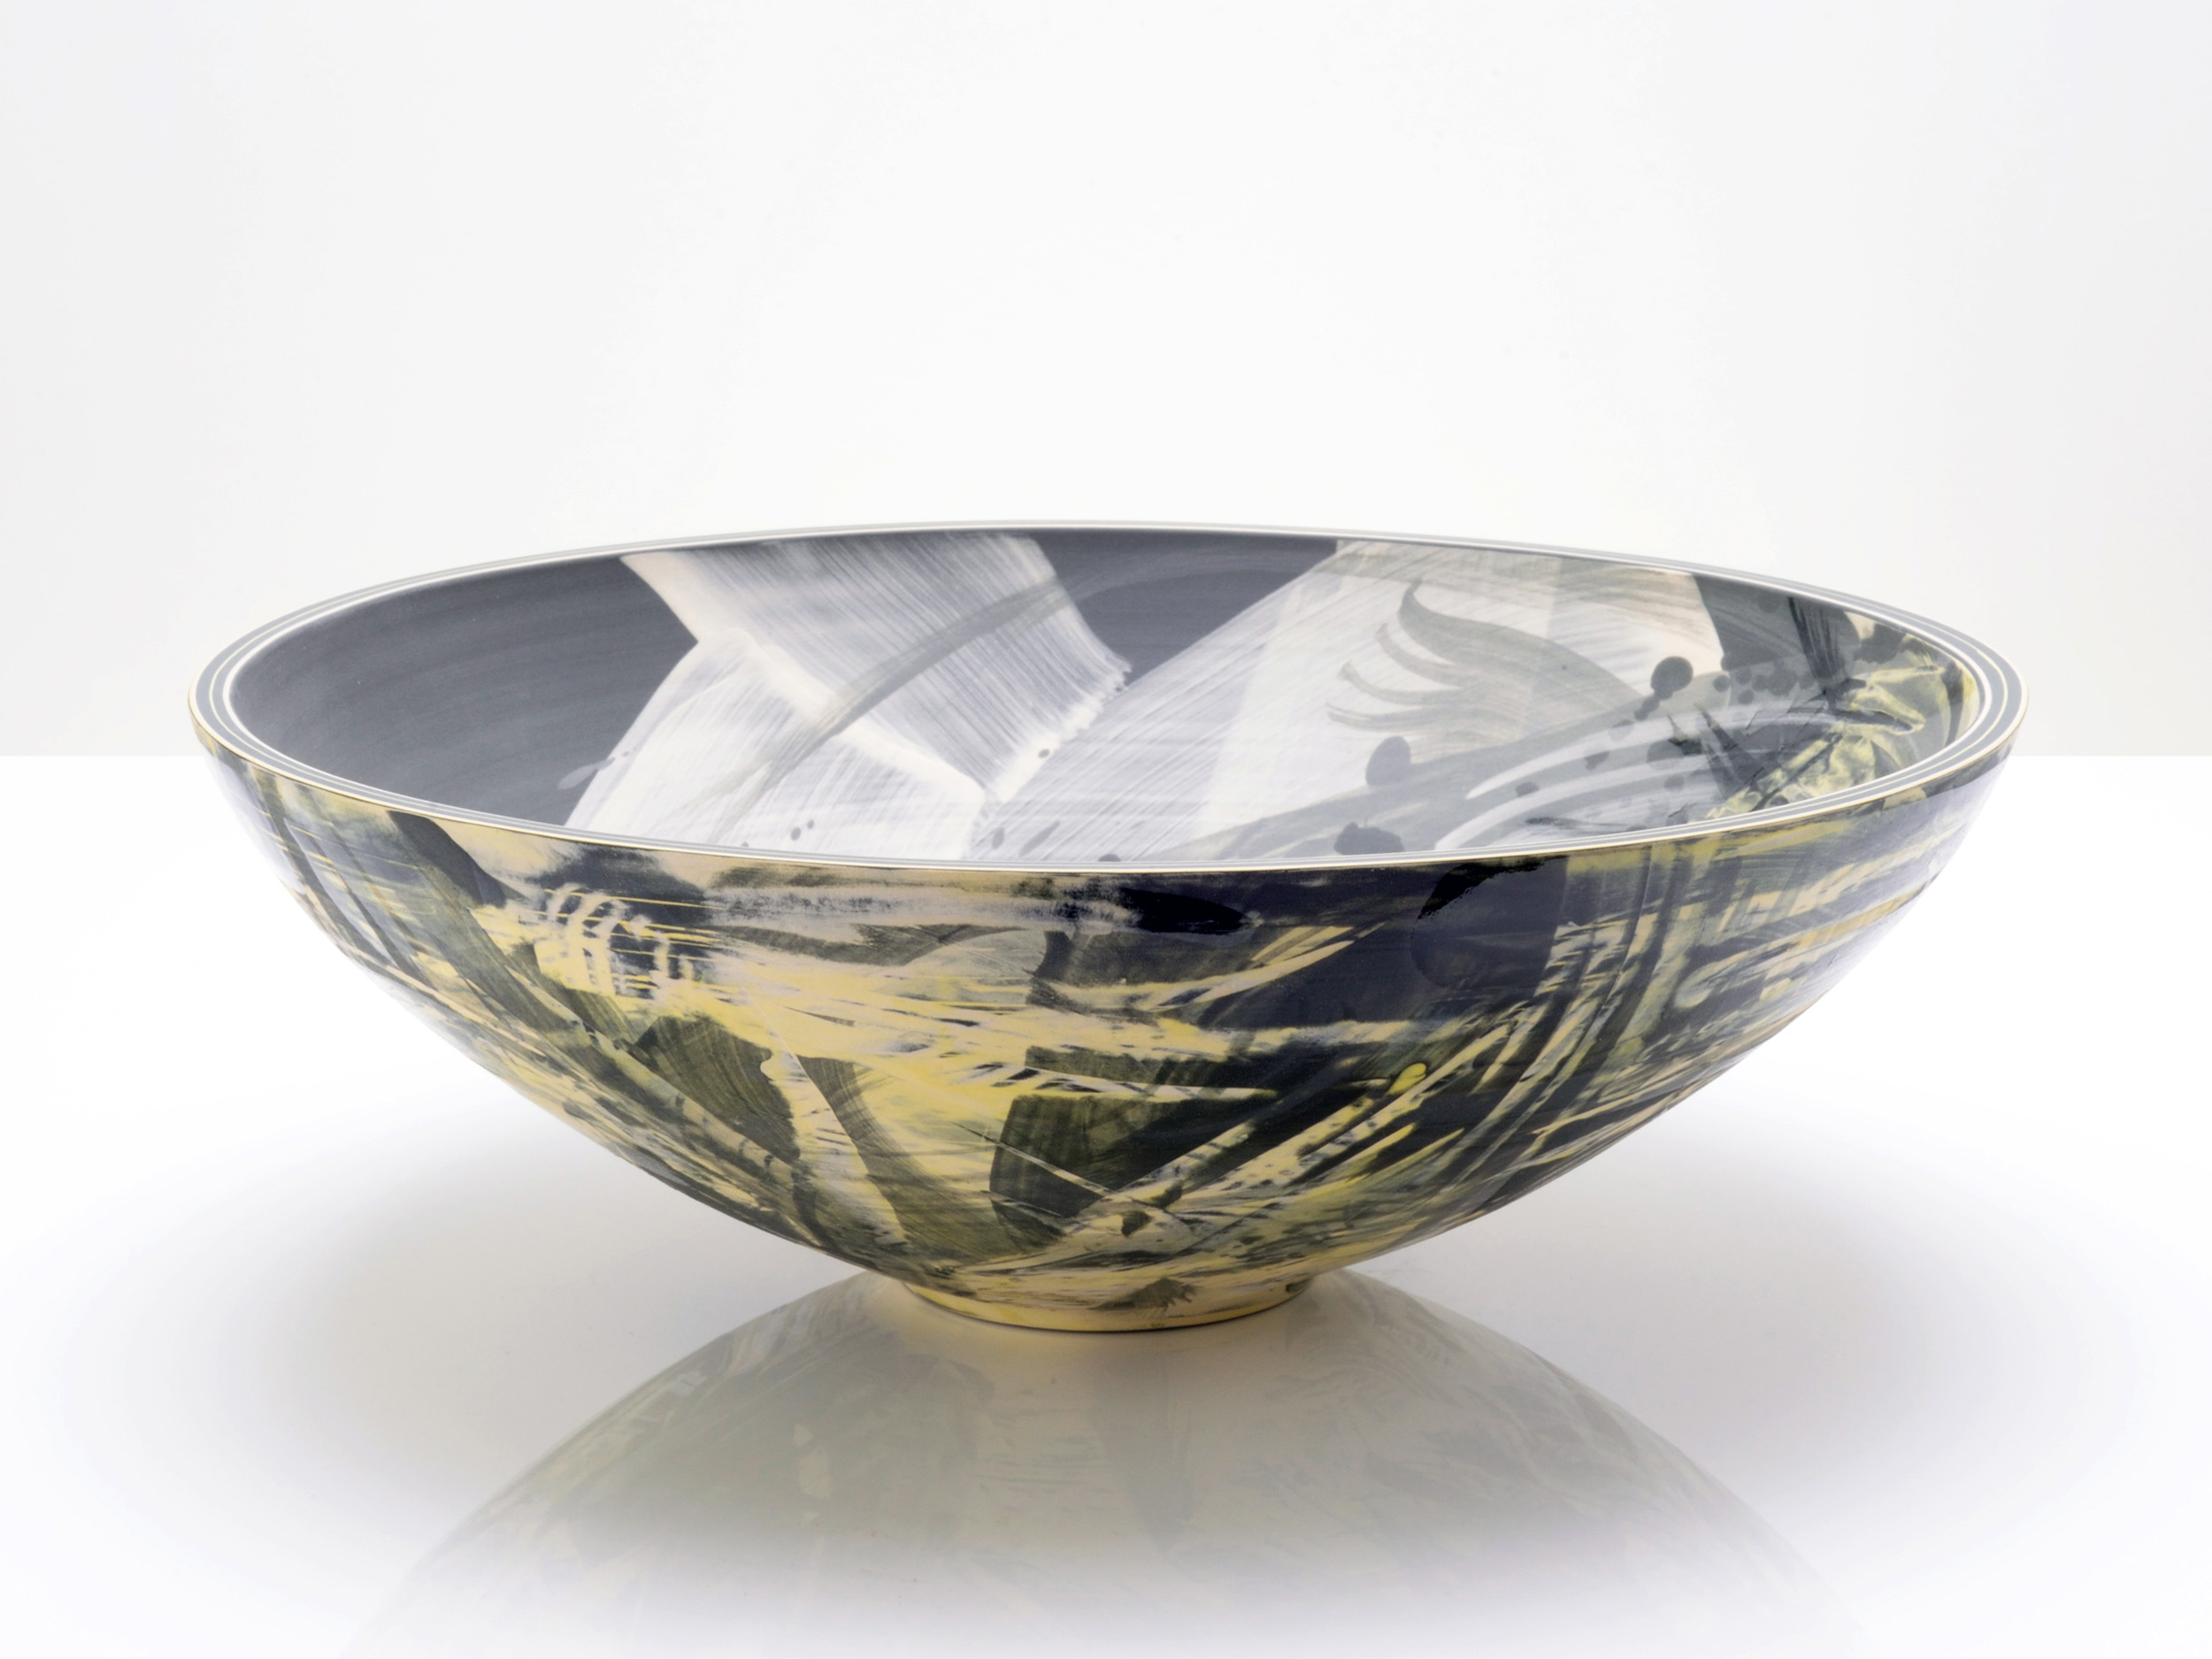 Yellow Grey Abstract Art Bowl by Rowena Gilbert